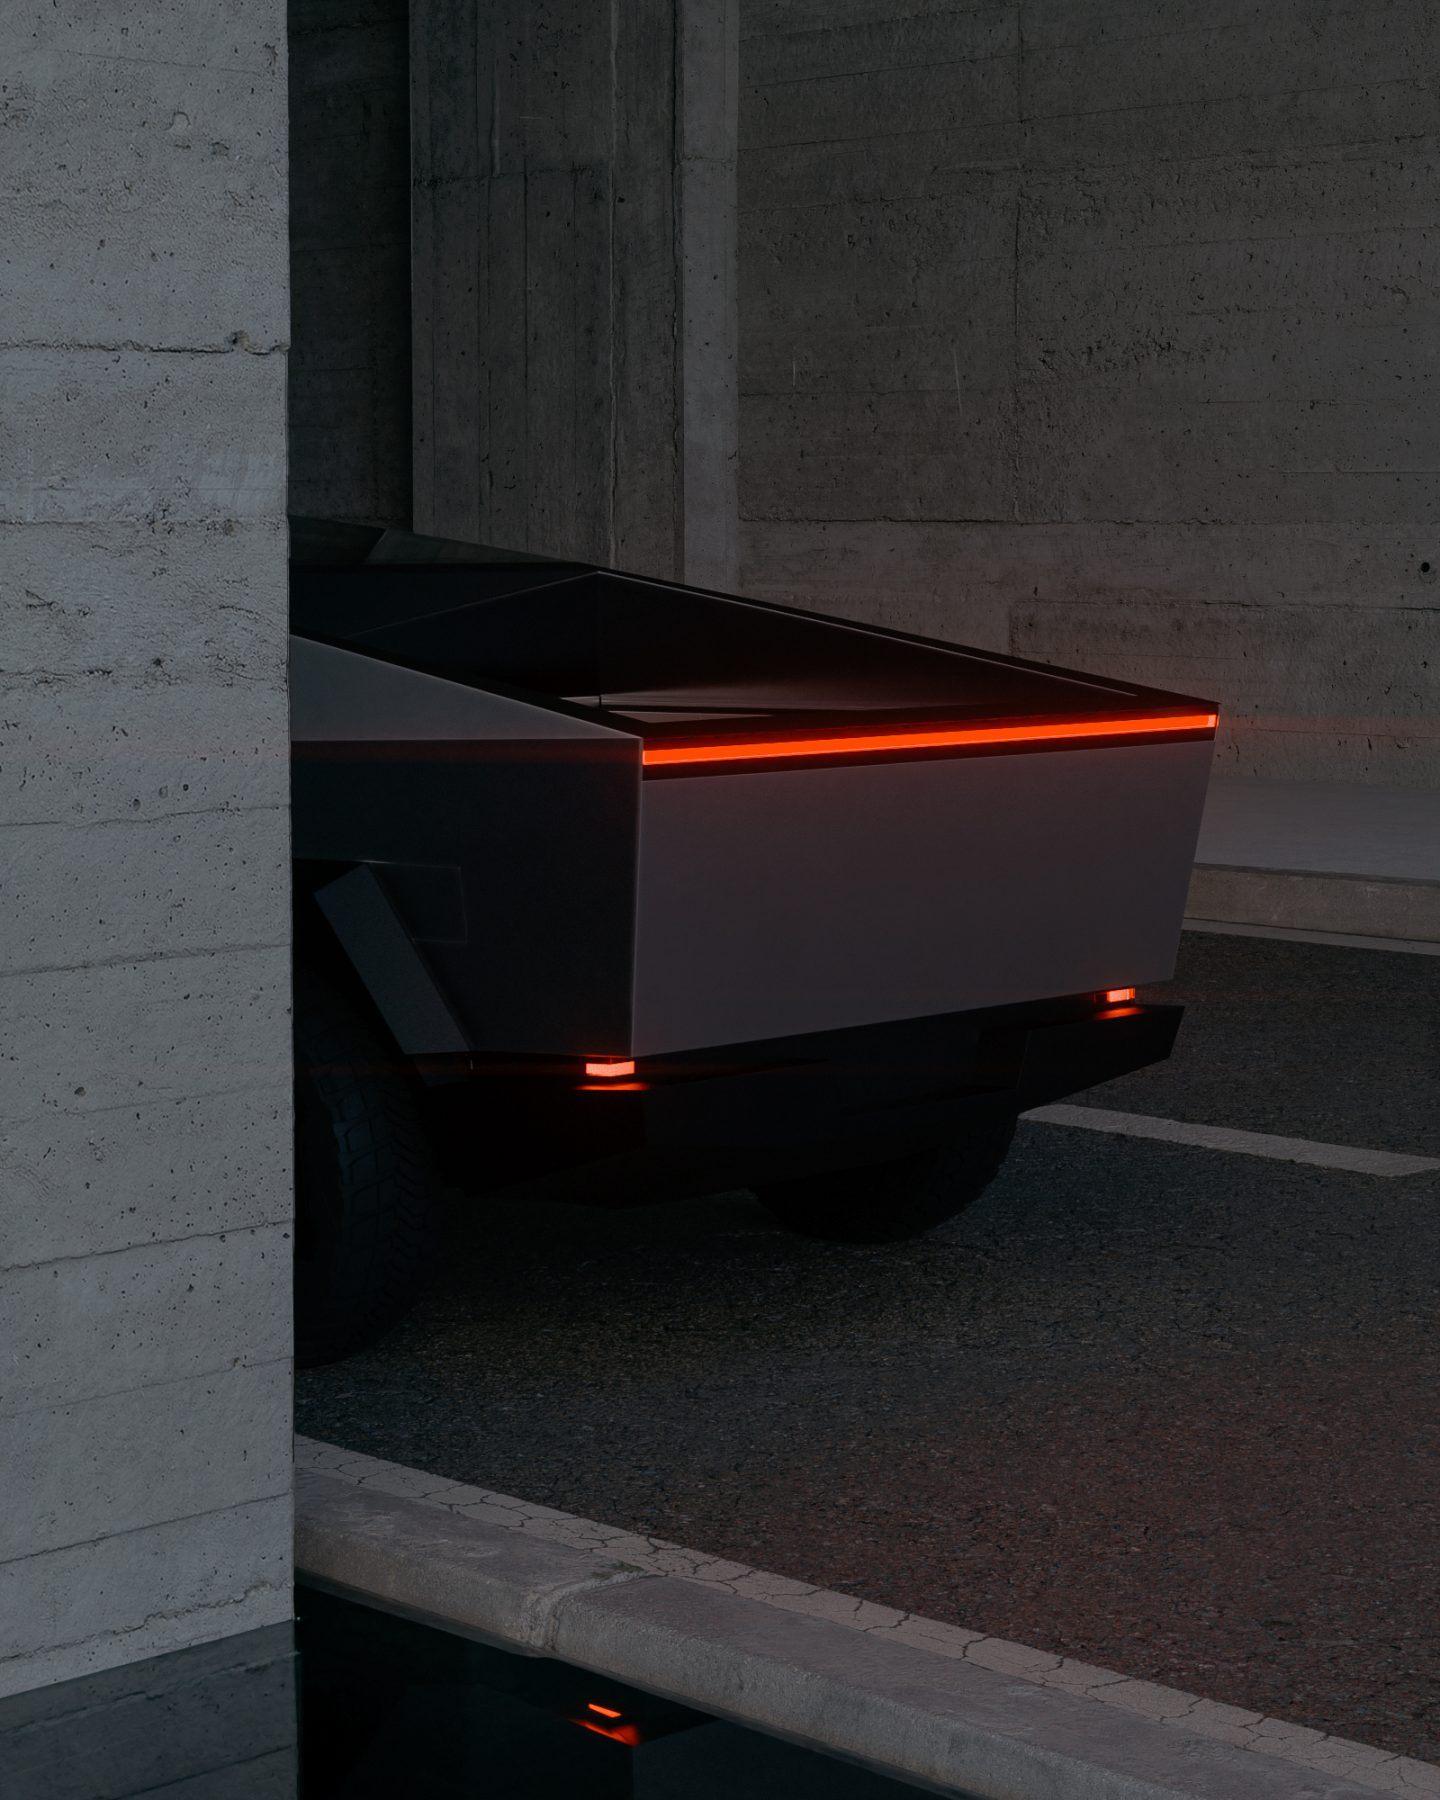 IGNANT-Tesla-cybertruck-cgi-brutalism-cgi-editorial-3